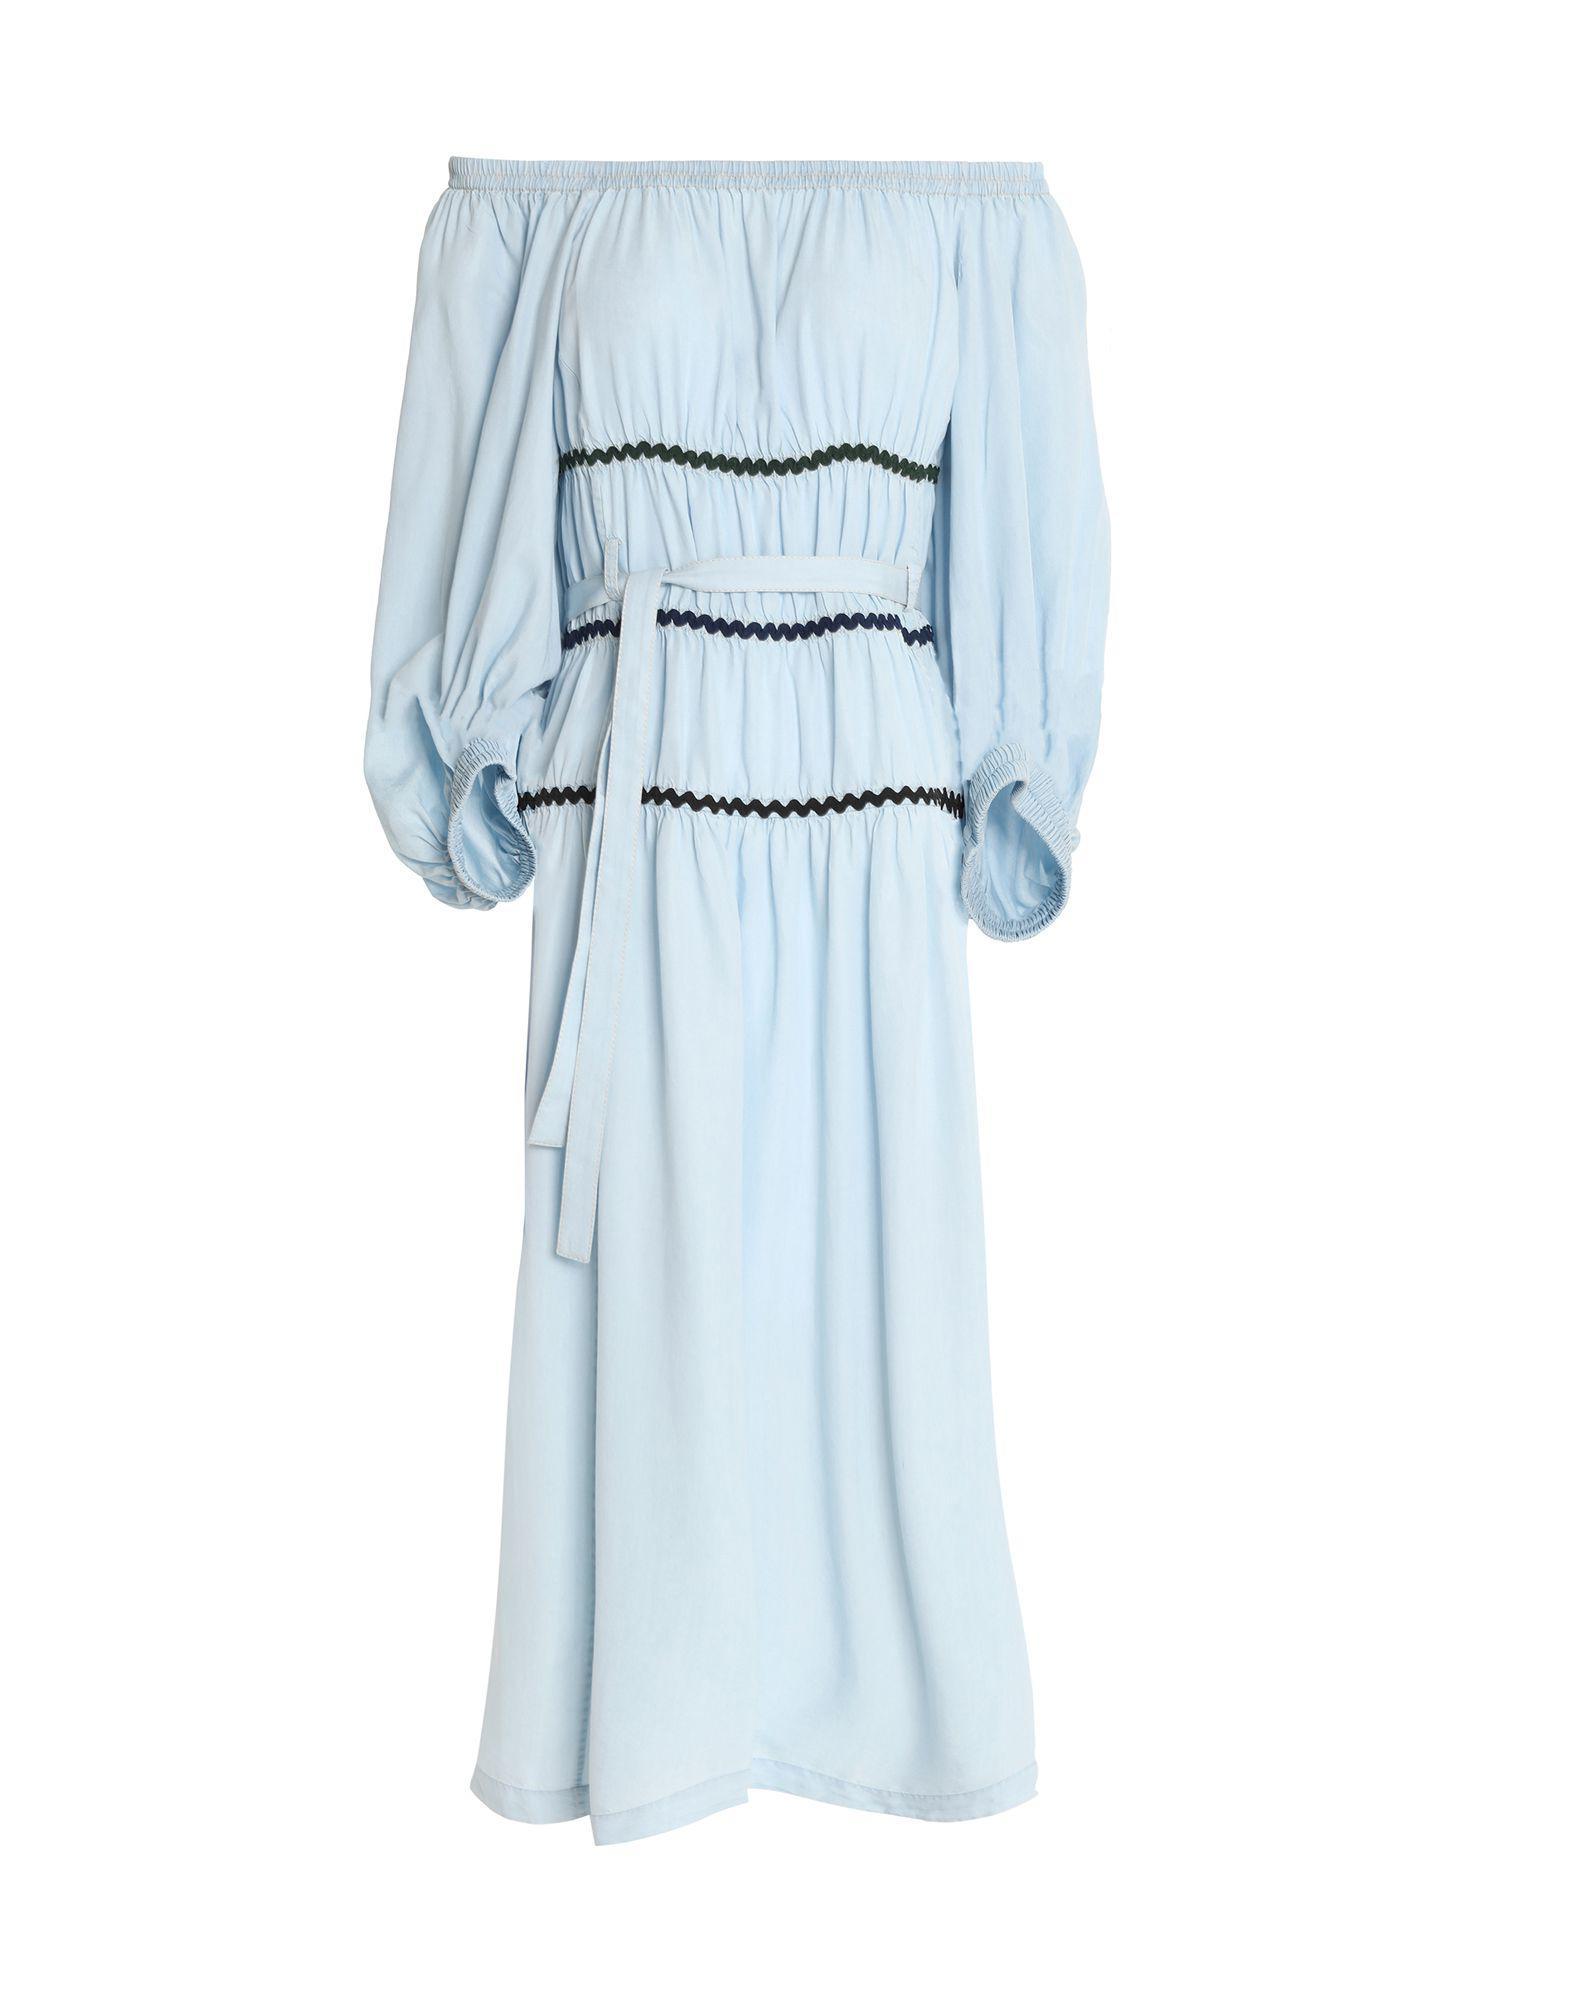 2e99000687cee5 Lyst - Sonia Rykiel Knee-length Dress in Blue - Save 41.96078431372549%